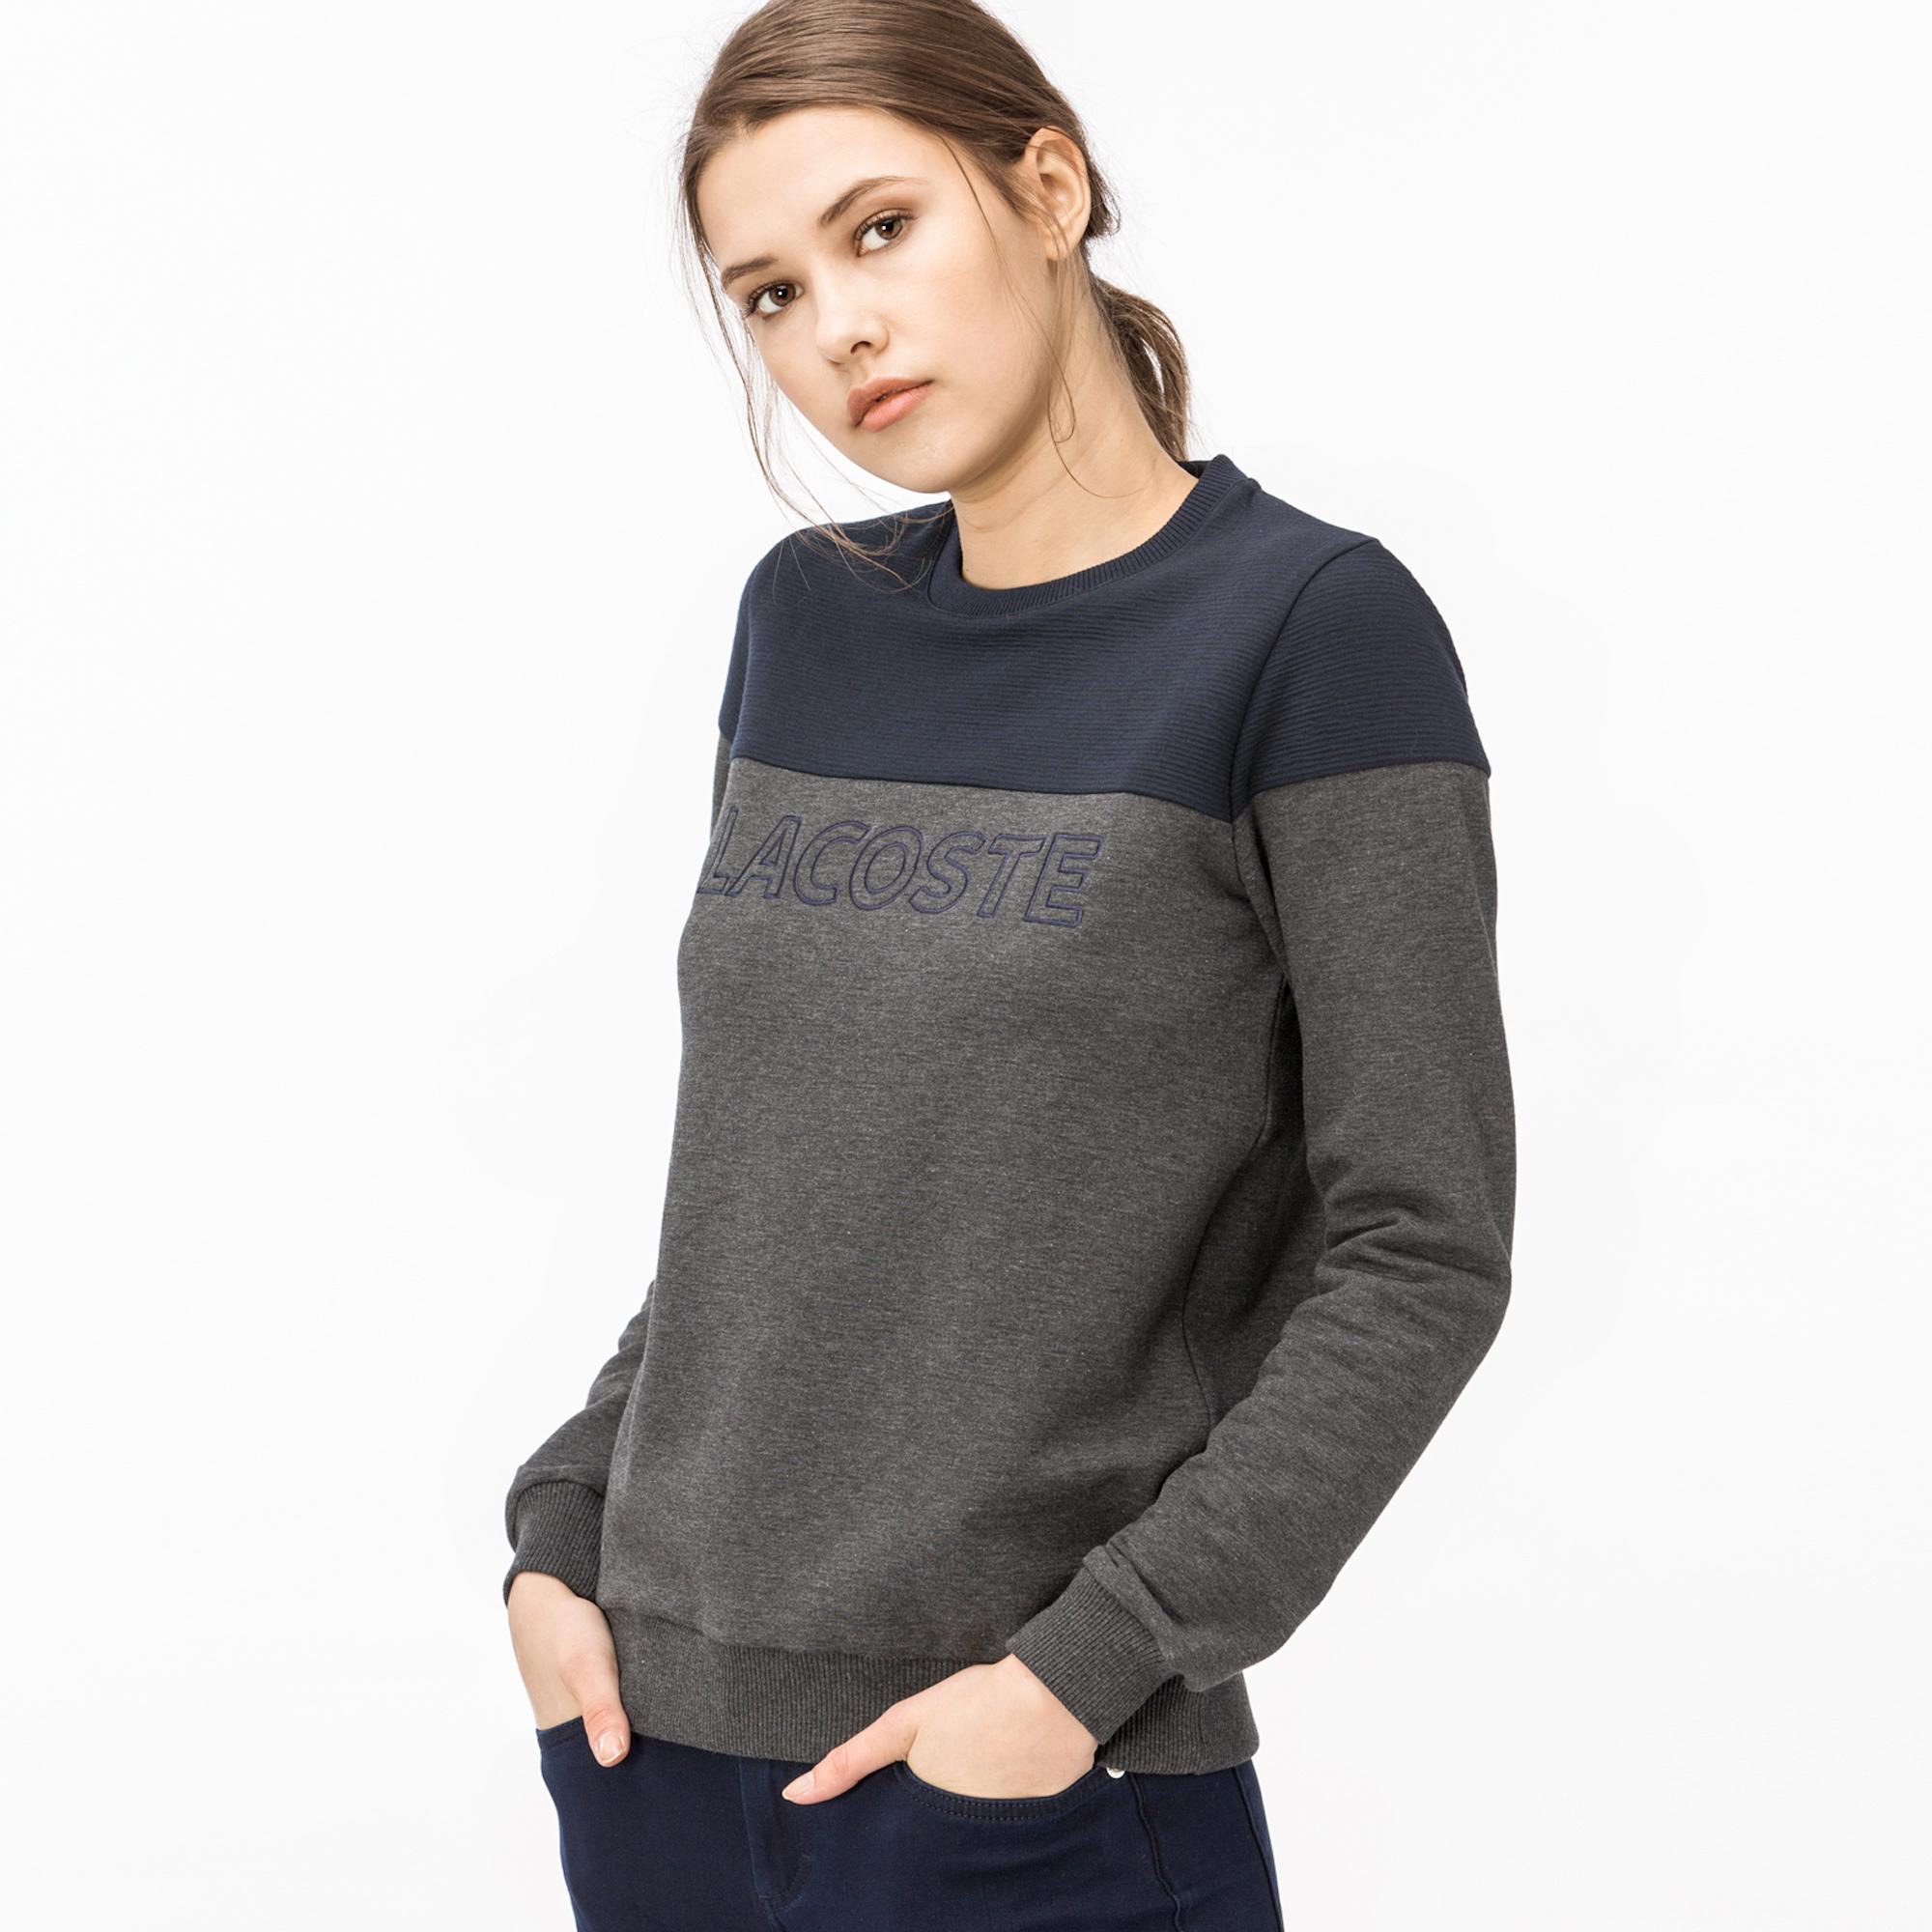 Lacoste Kadın Lacivert-Gri Sweatshirt